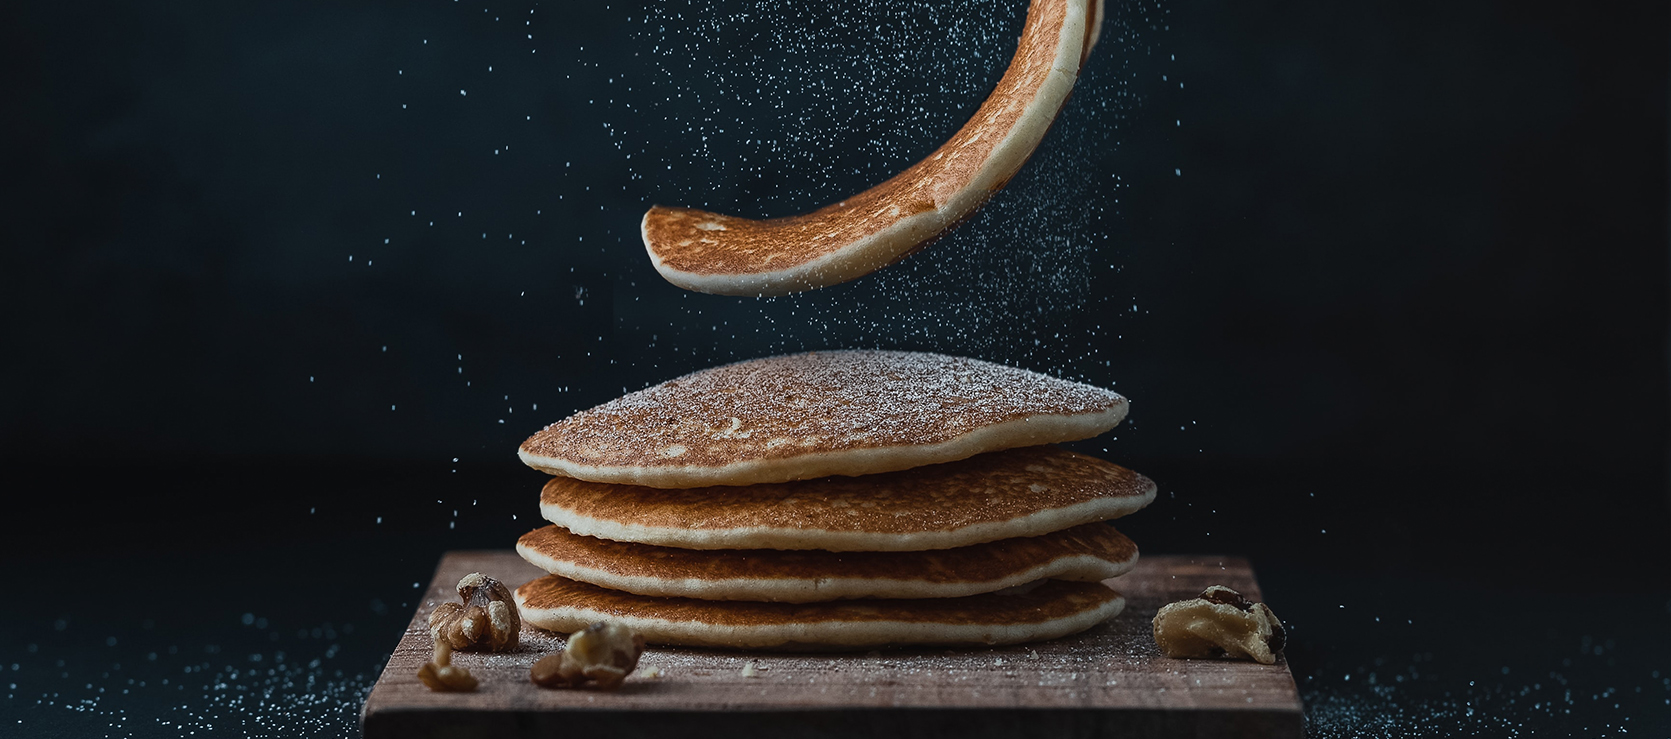 Pancakes z Pastą Orzechową